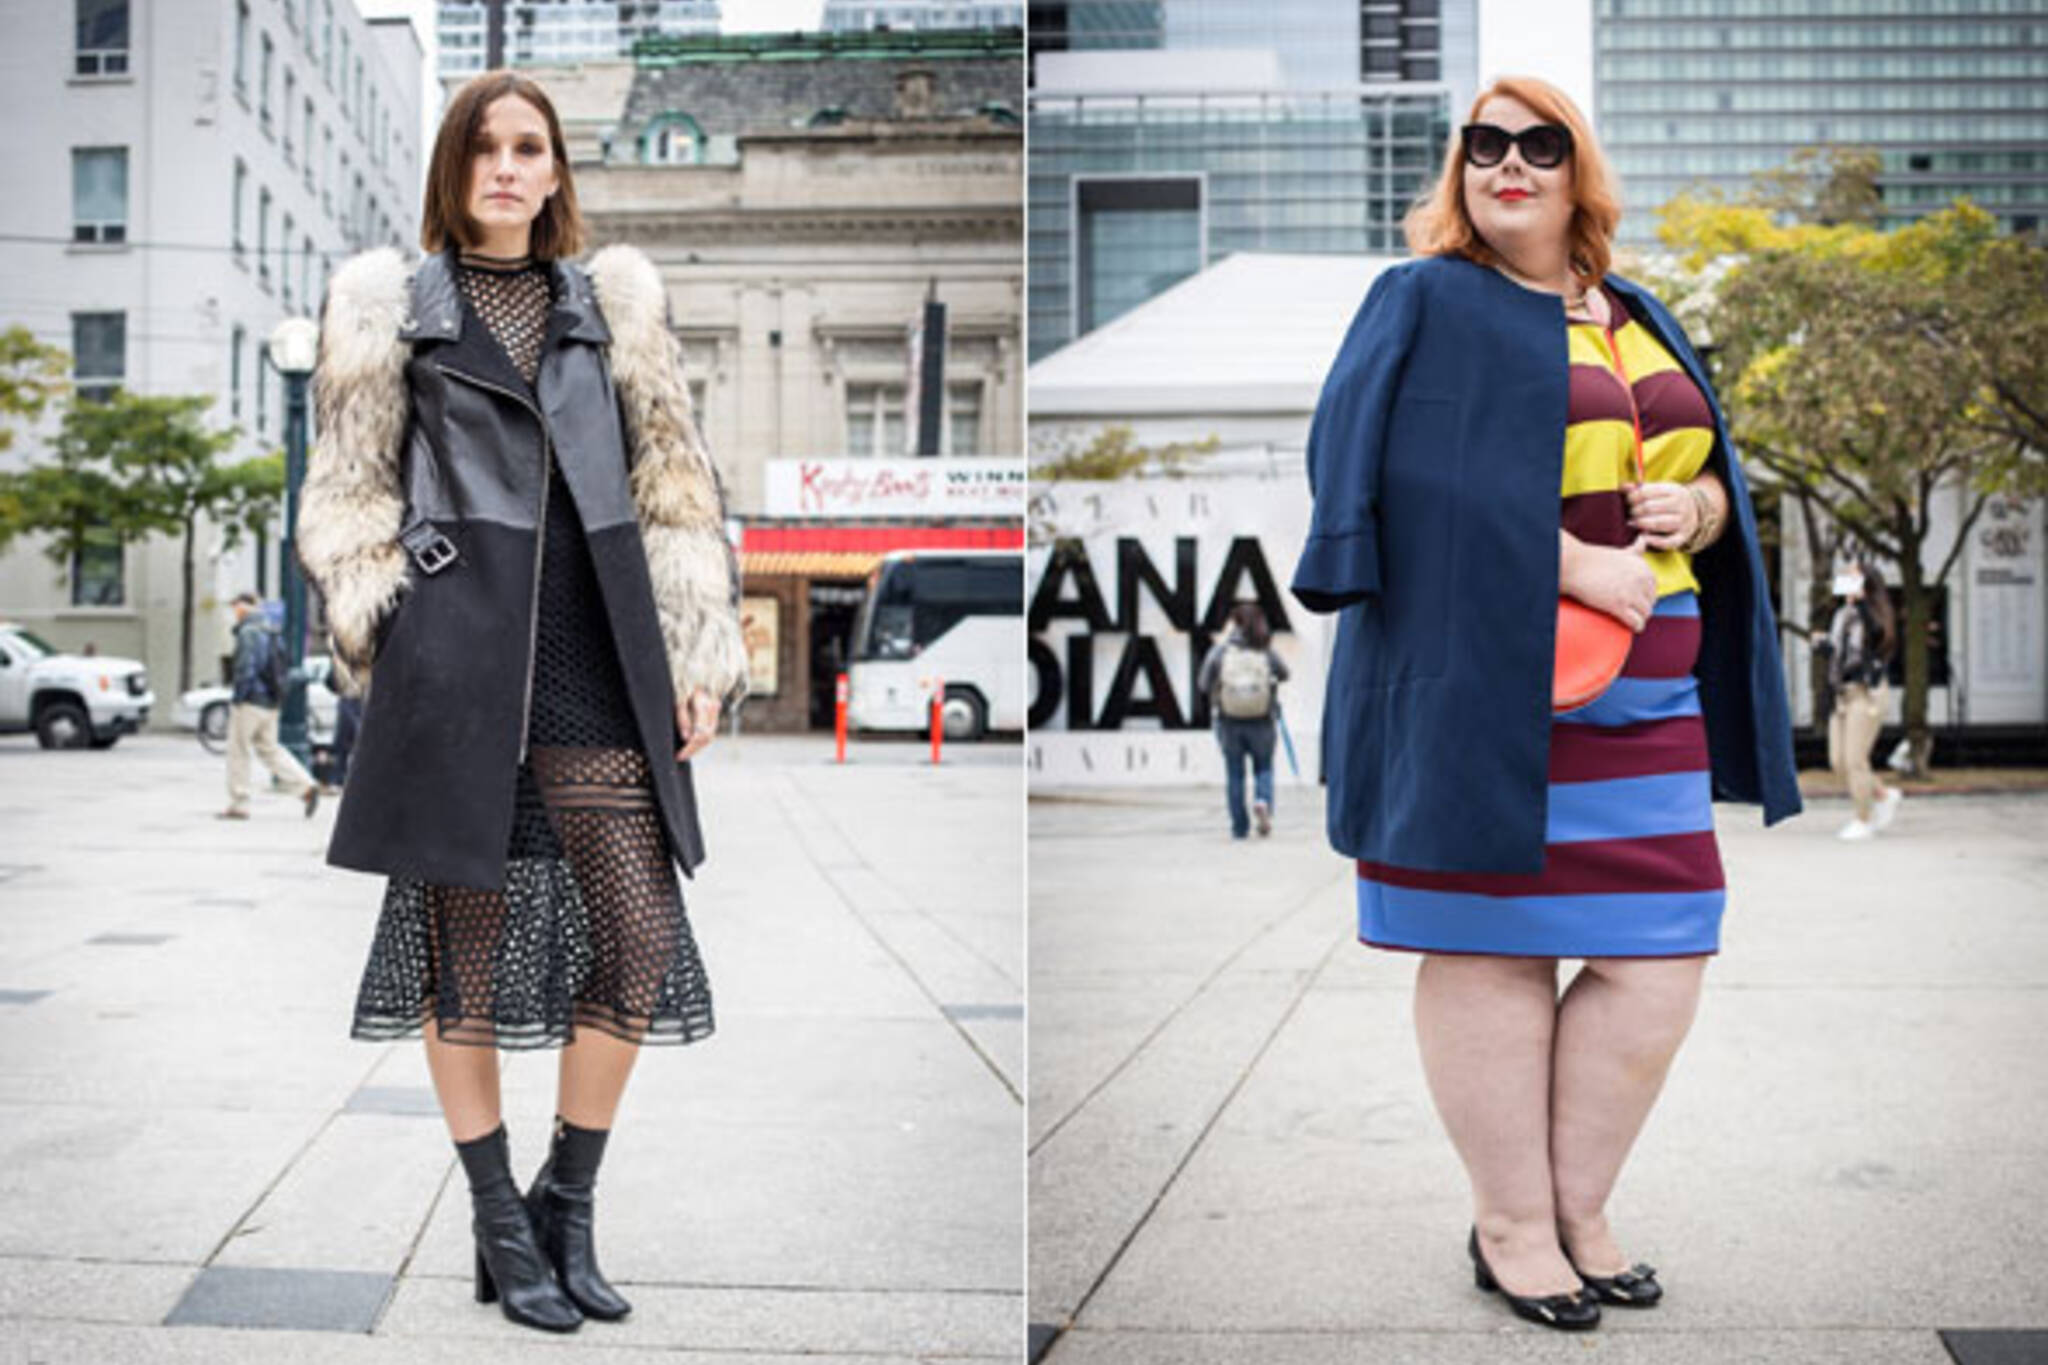 ff84d707b20 Street Style: 20 looks from Toronto Fashion Week